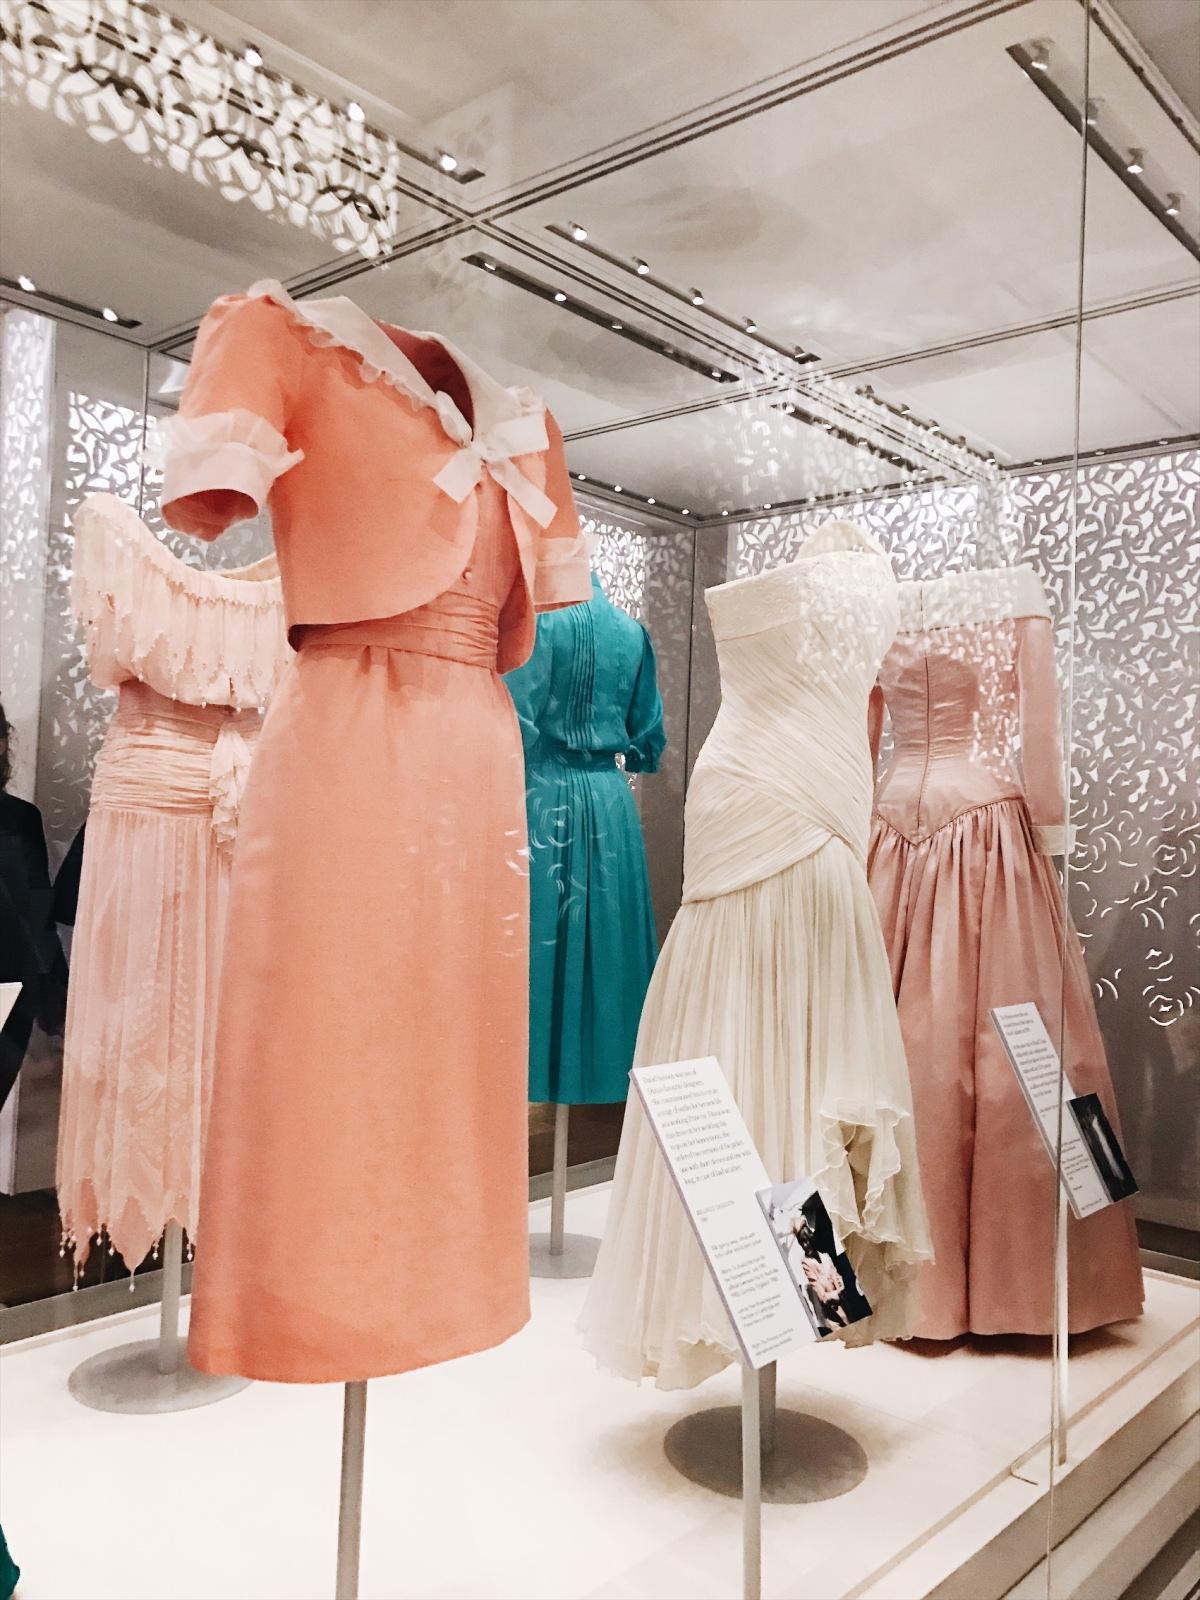 fashion exhibit, Kensington Palace, Princess Diana fashion exhibit, Diana: Her Fashion Story